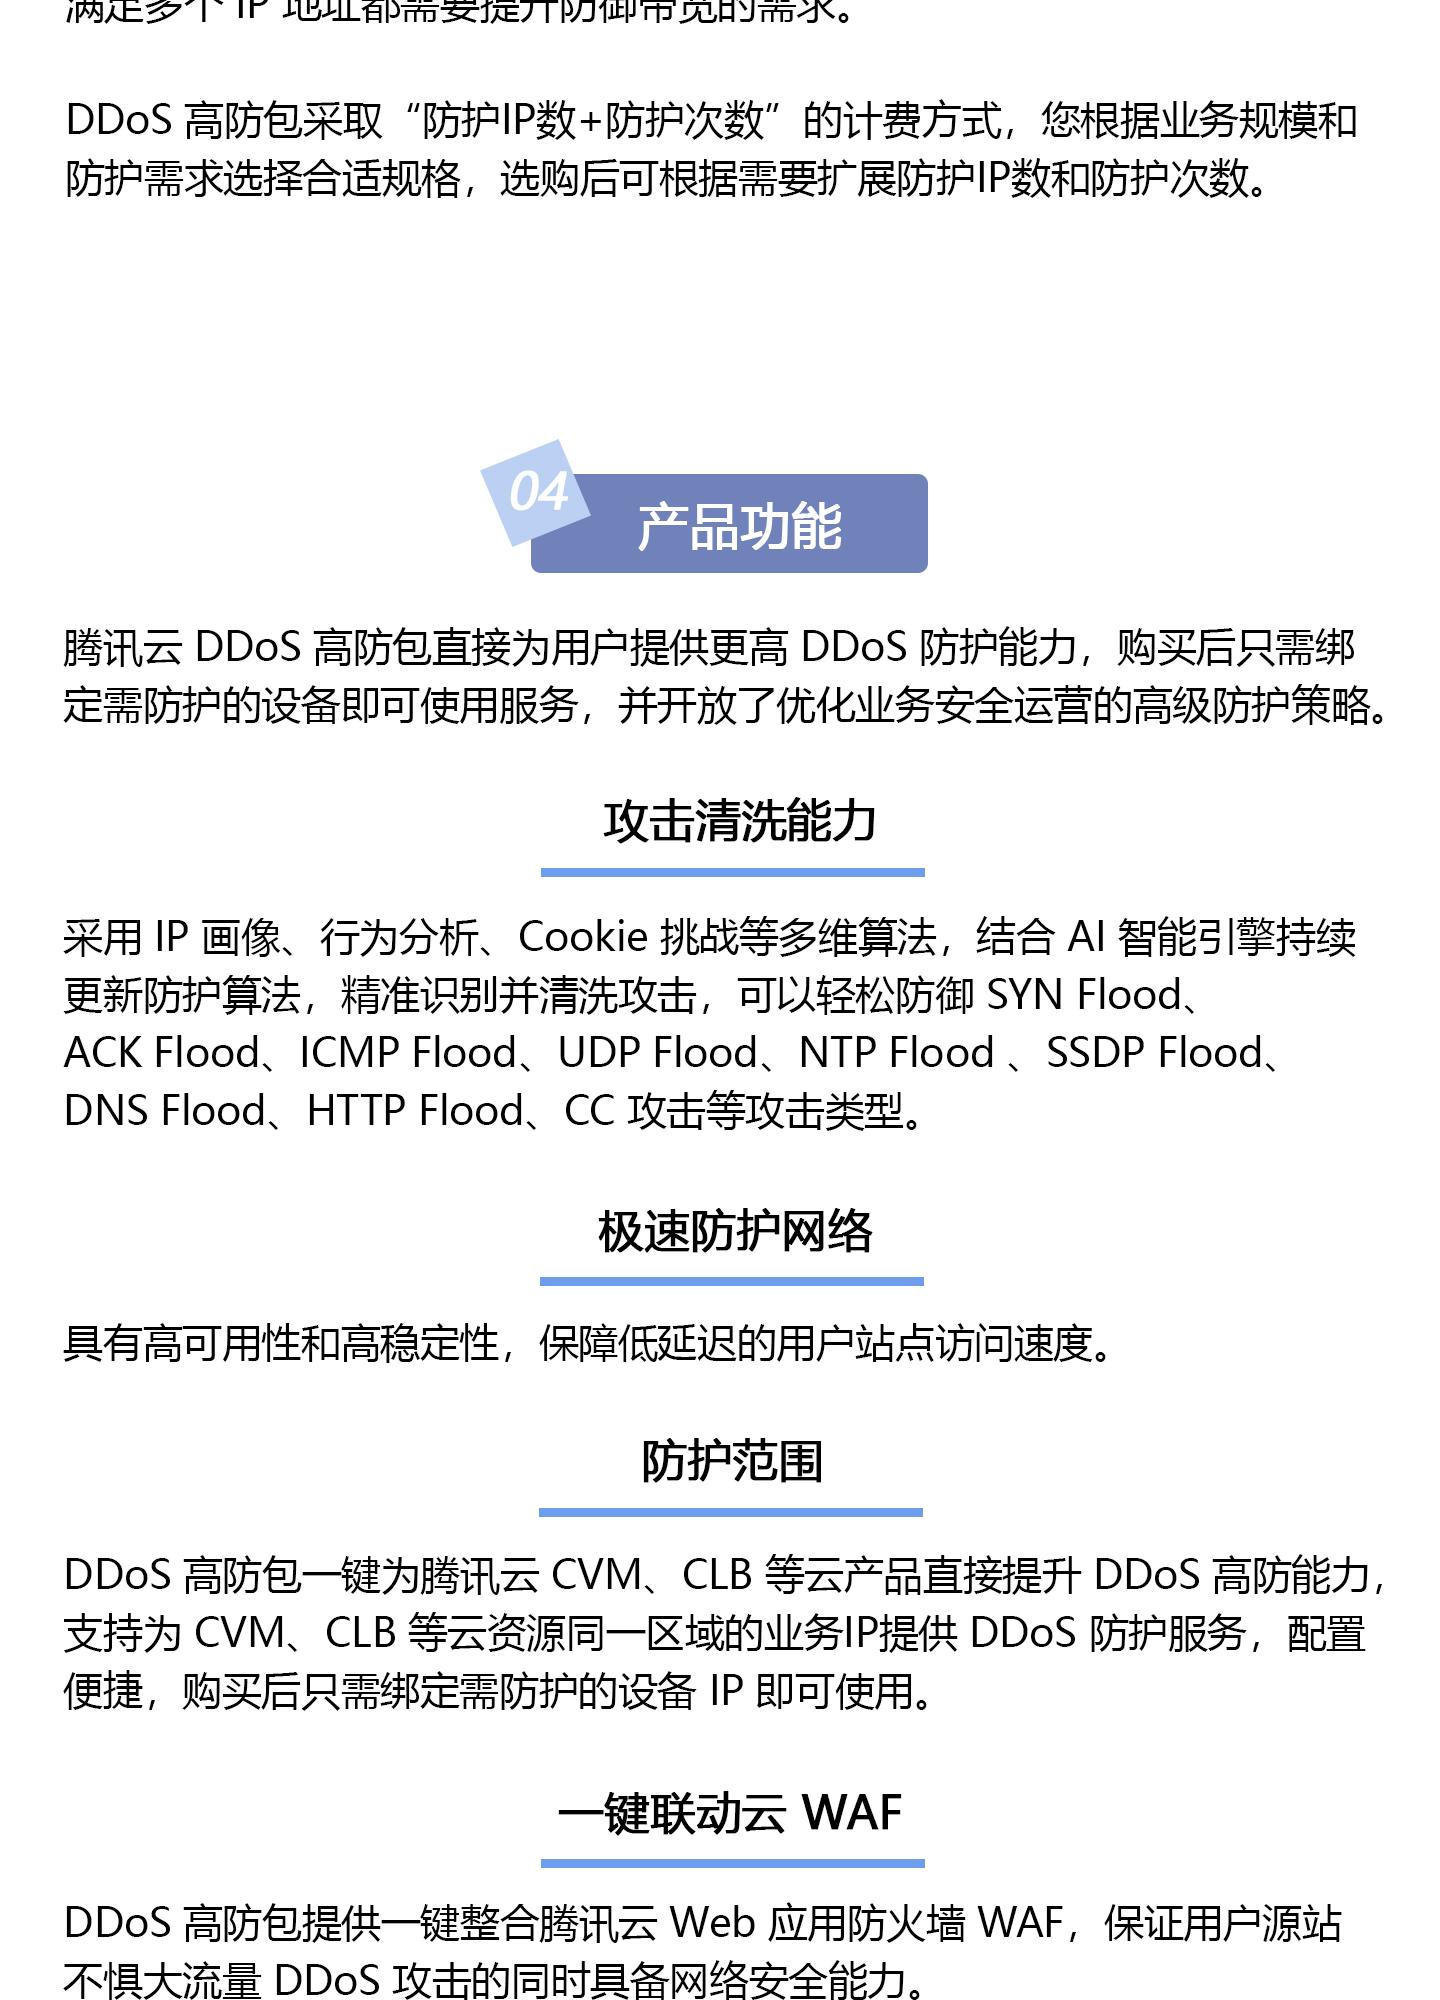 T-Sec-DDoS-高防包1440_06.jpg